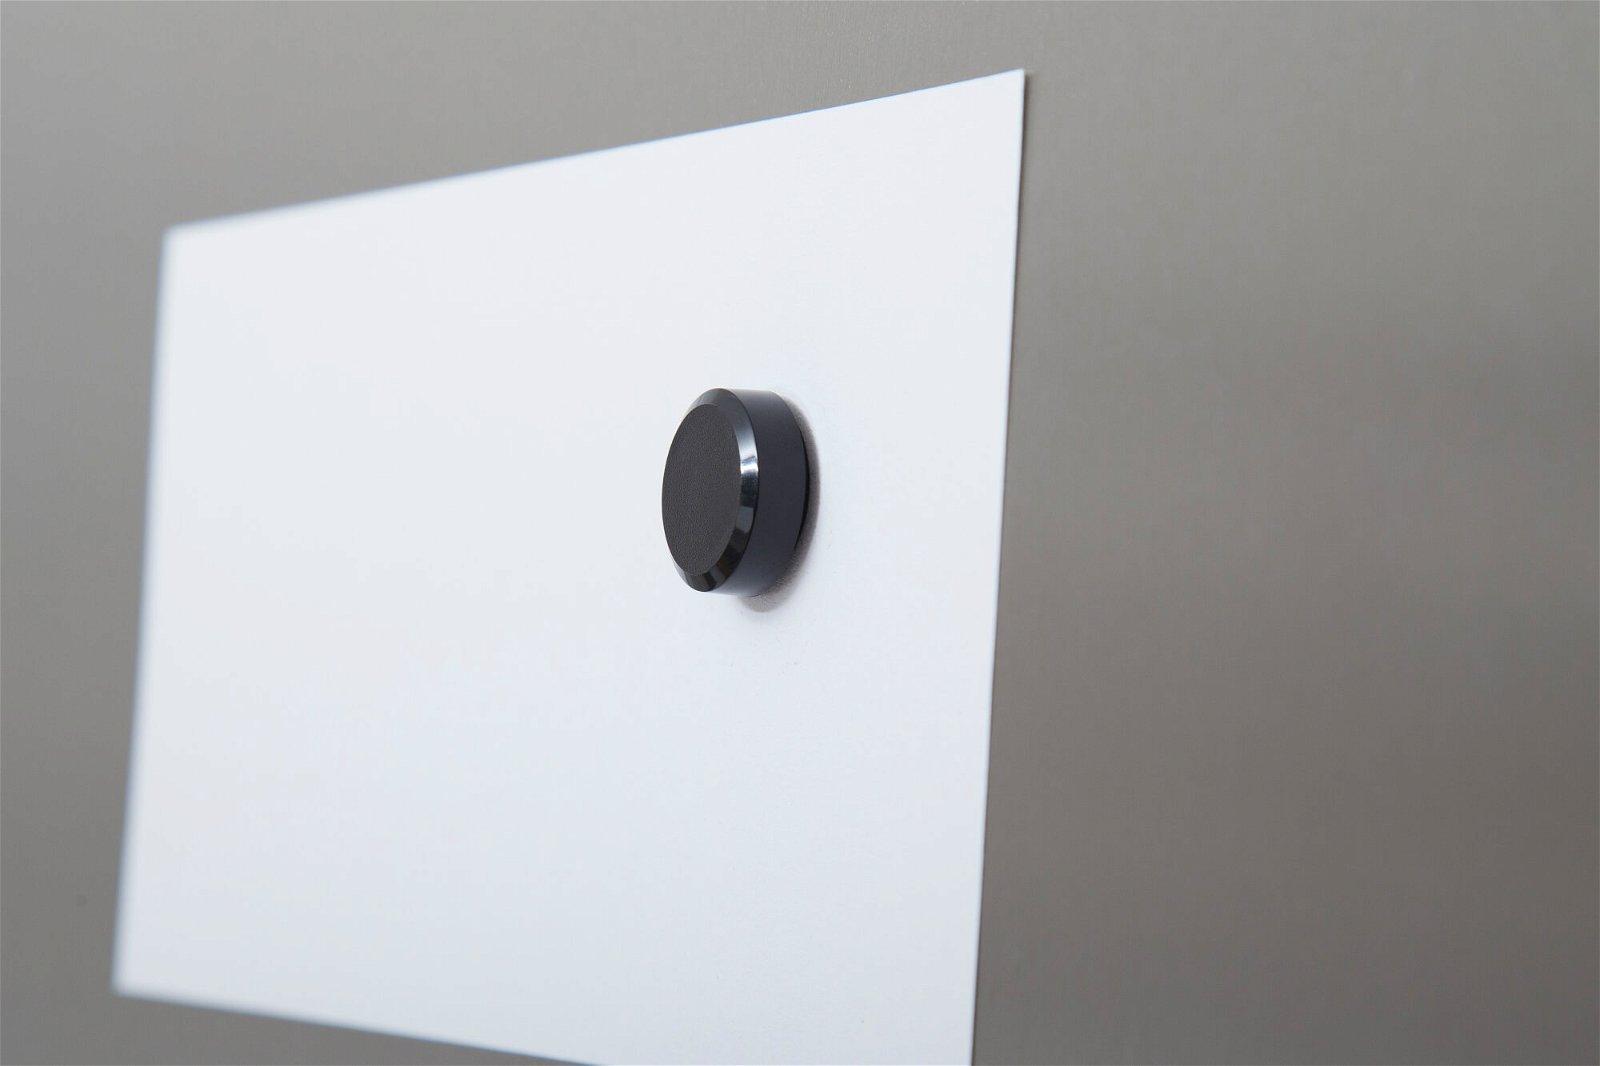 Facetterand-Magnet MAULpro Ø 20 mm, 0,3 kg, 20 St./Set, schwarz